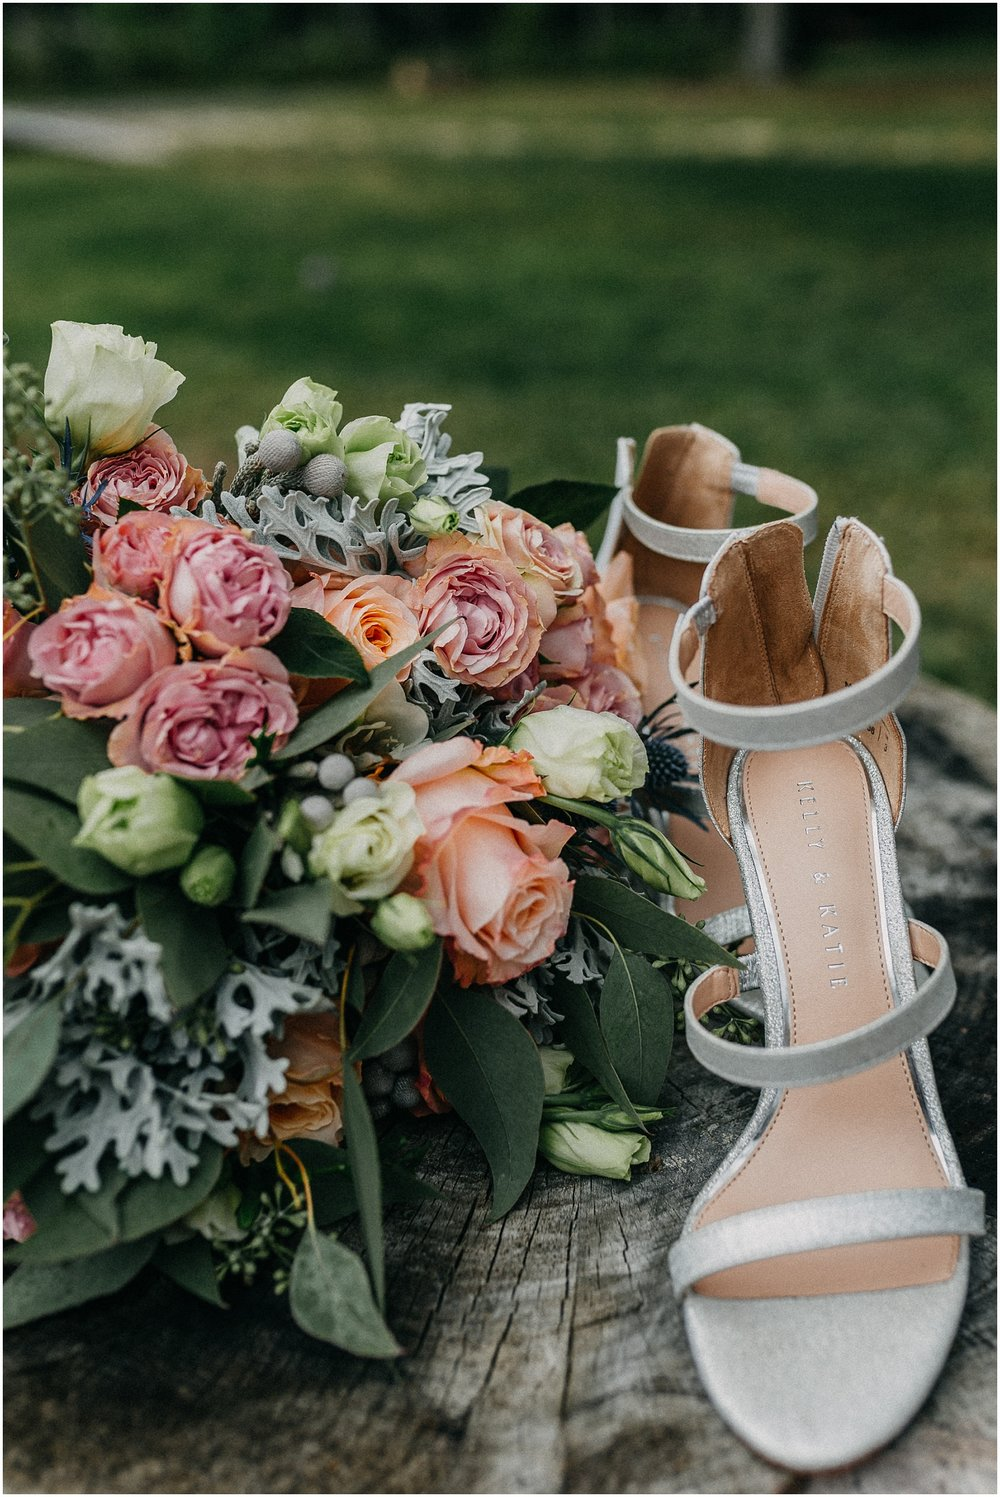 waterloo-village-waterloo village-wedding-outdoor wedding-rustic-boemian-new jersey-bride-groom-wedding party-davids bridal-wedding dress-wedding-first kiss-intimate wedding_0350.jpg